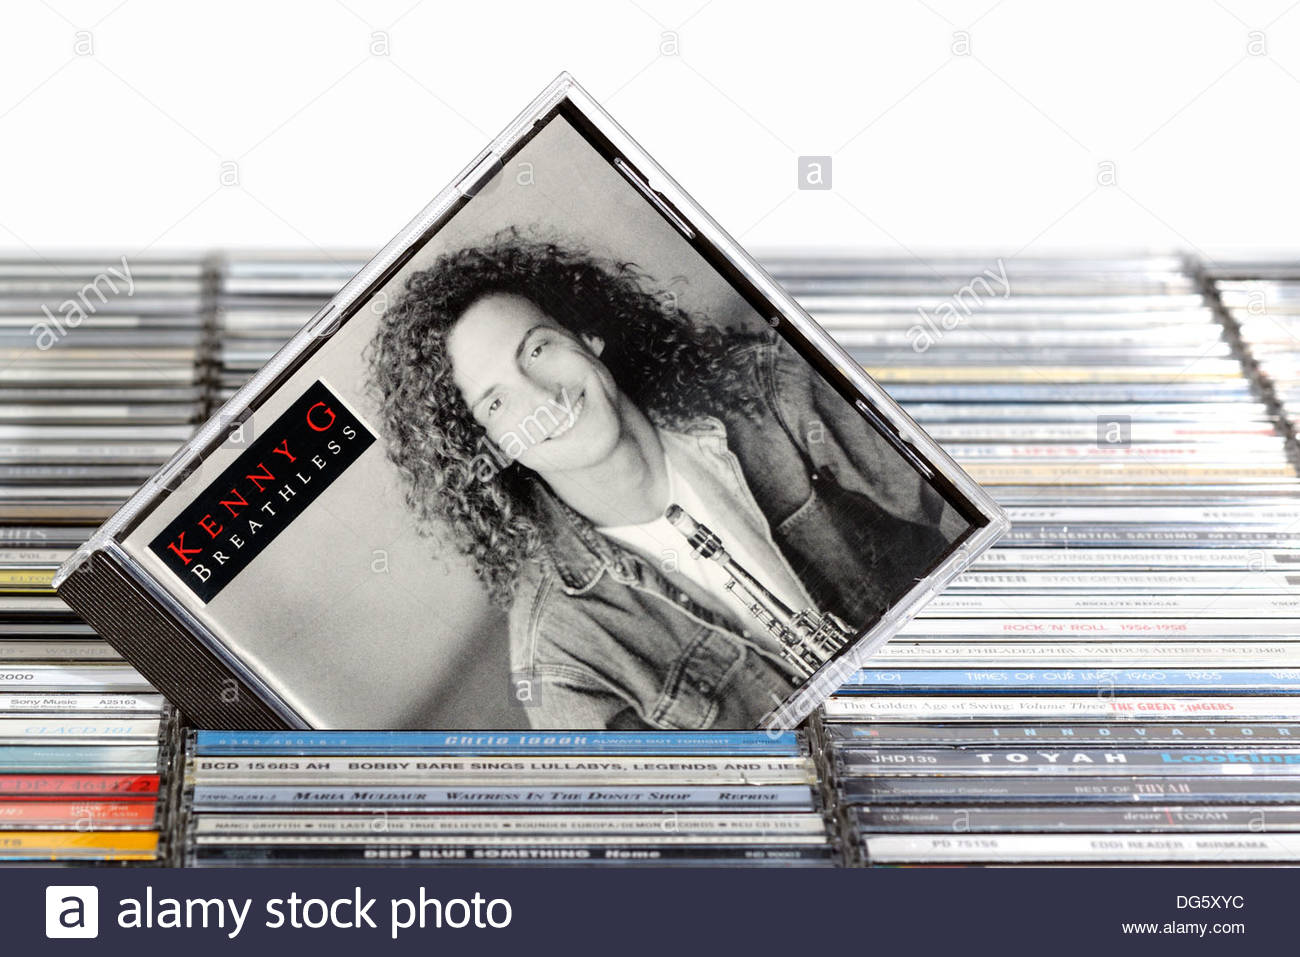 Kenny G album Breathless, piled music CD cases, England - Stock Image